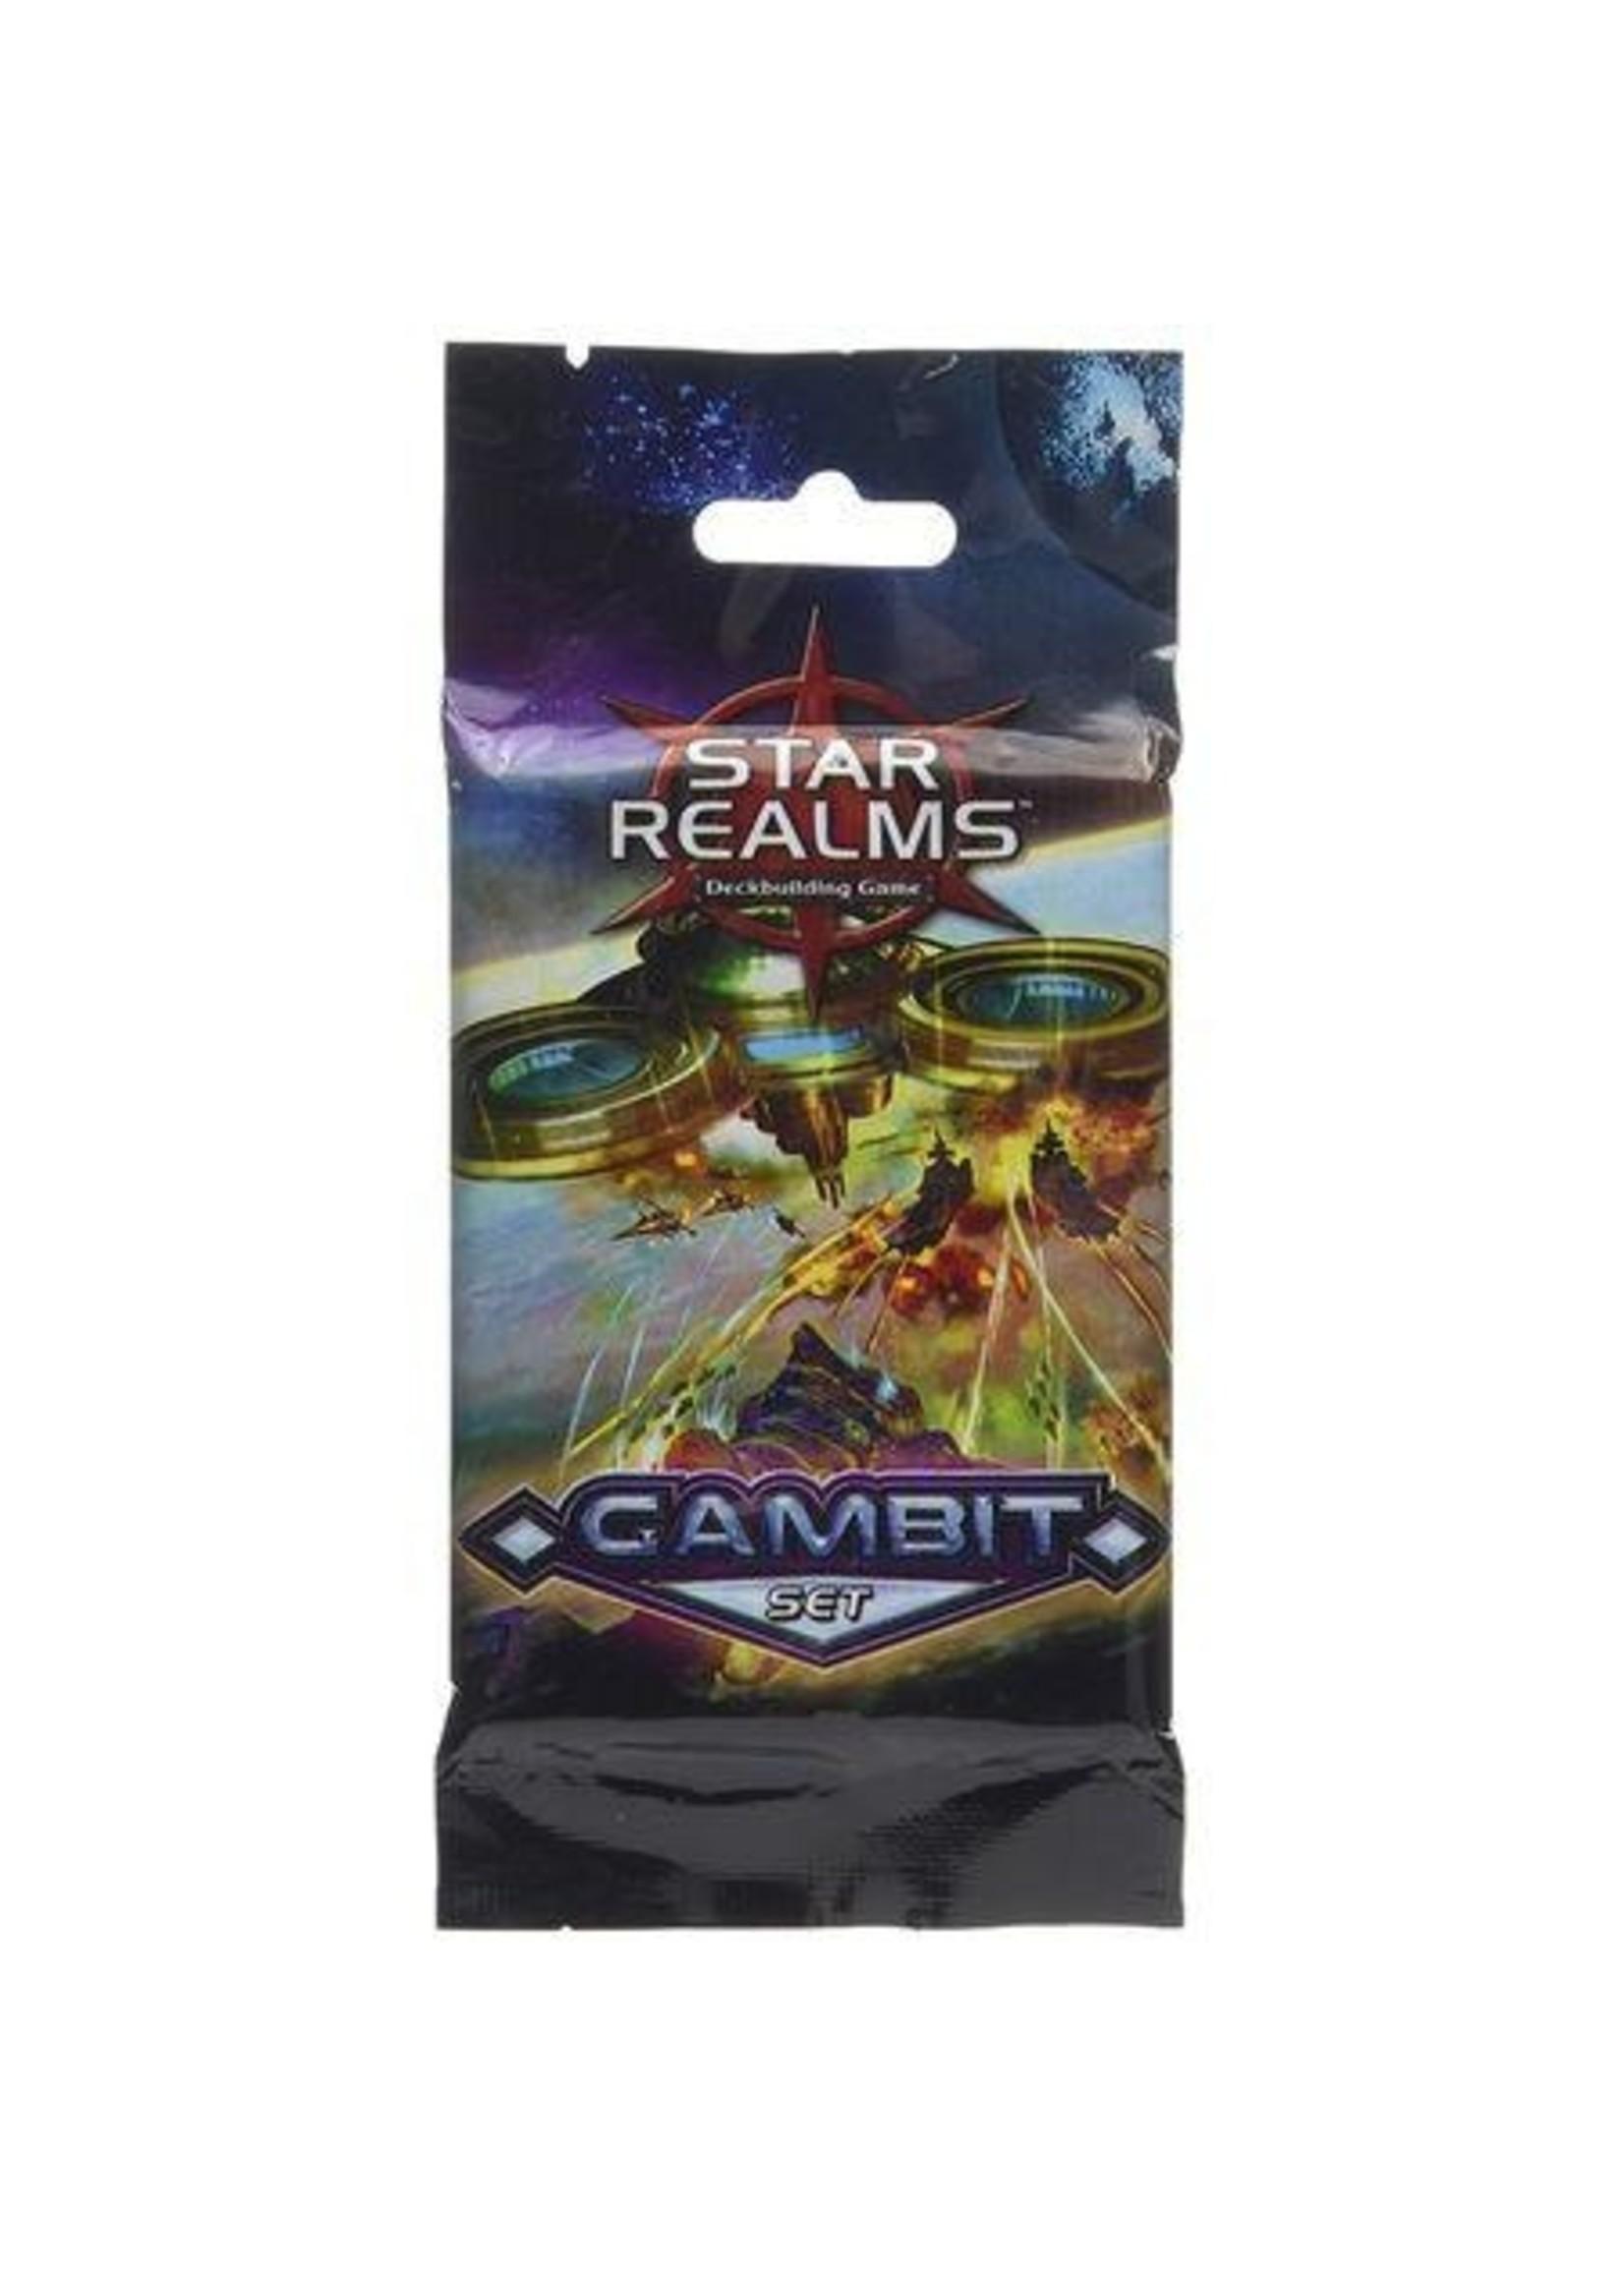 Star Realms Deck Building Game: Gambit Set